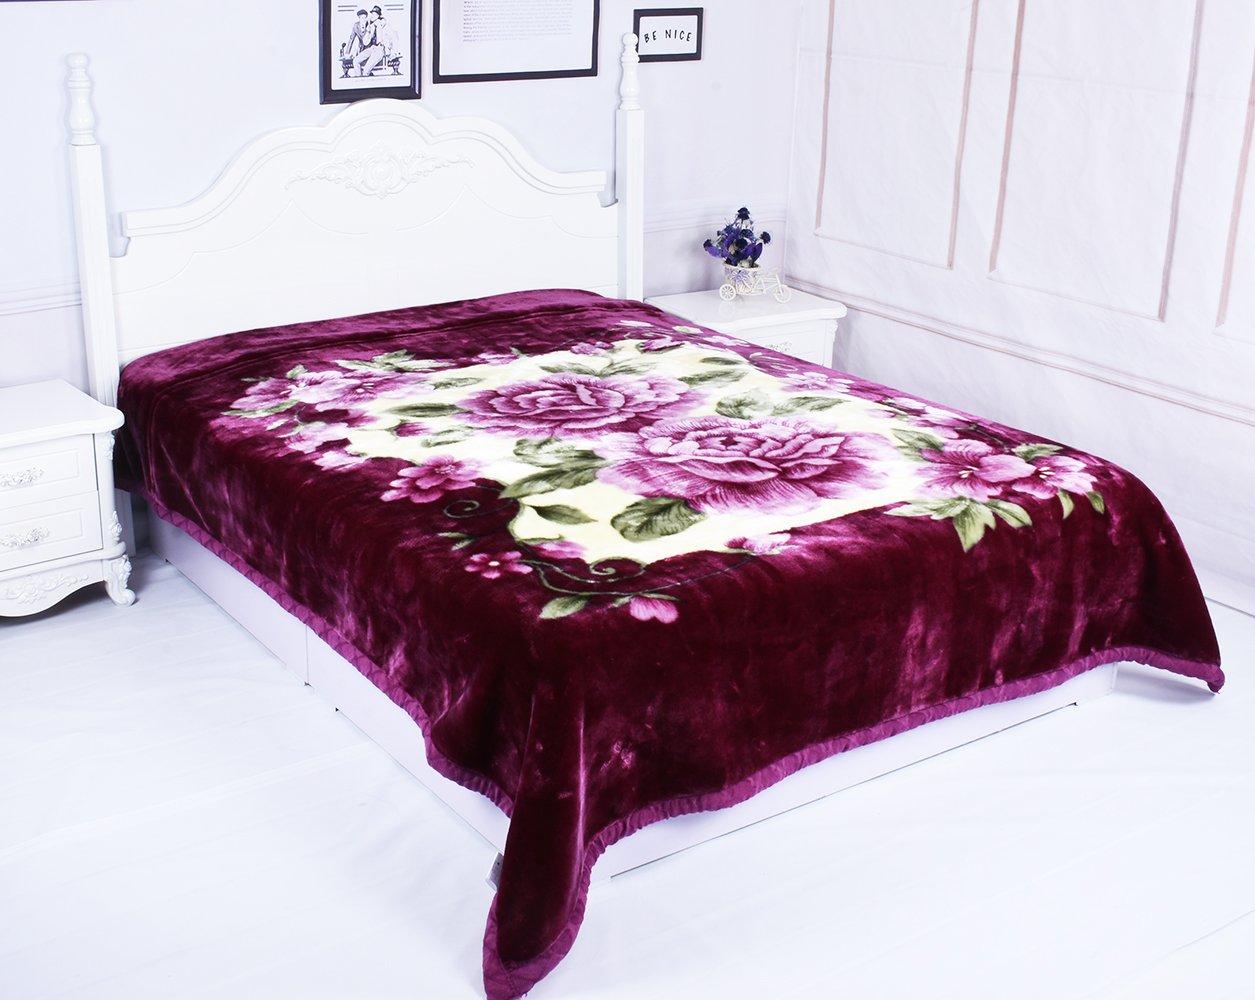 Cheap Plush Blankets King Size Find Plush Blankets King